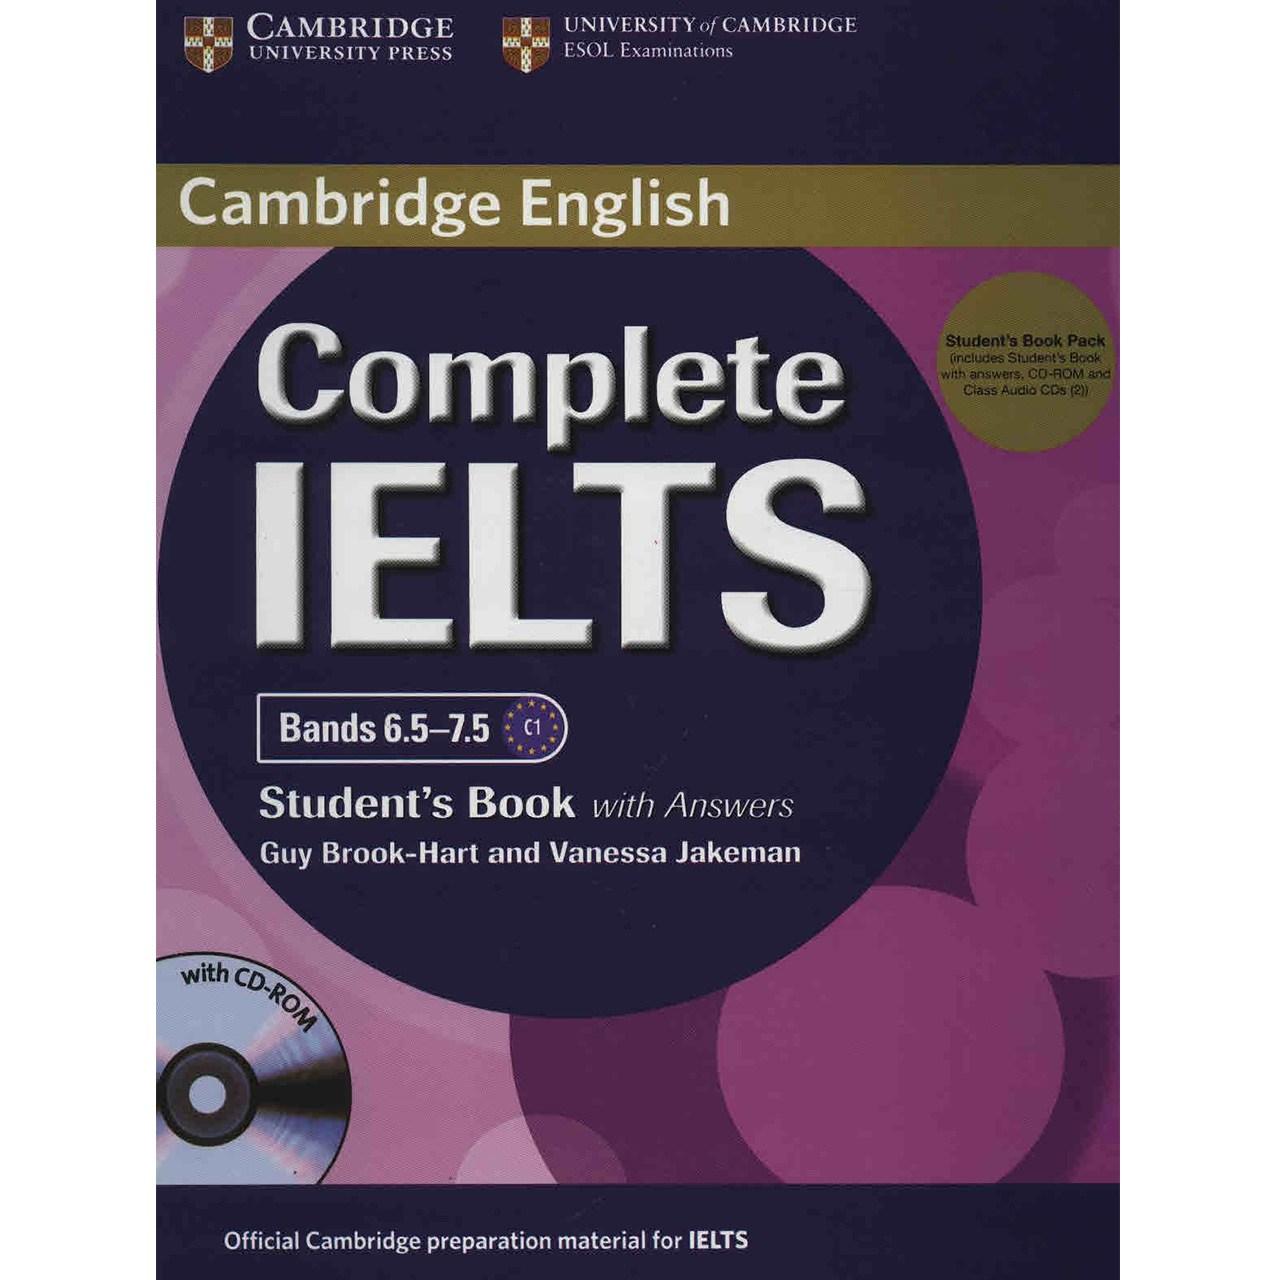 کتاب زبان Complete IELTS Bands 6.5 -7.5 Students Book and Workbook اثر گای بروک هارت - دو جلدی